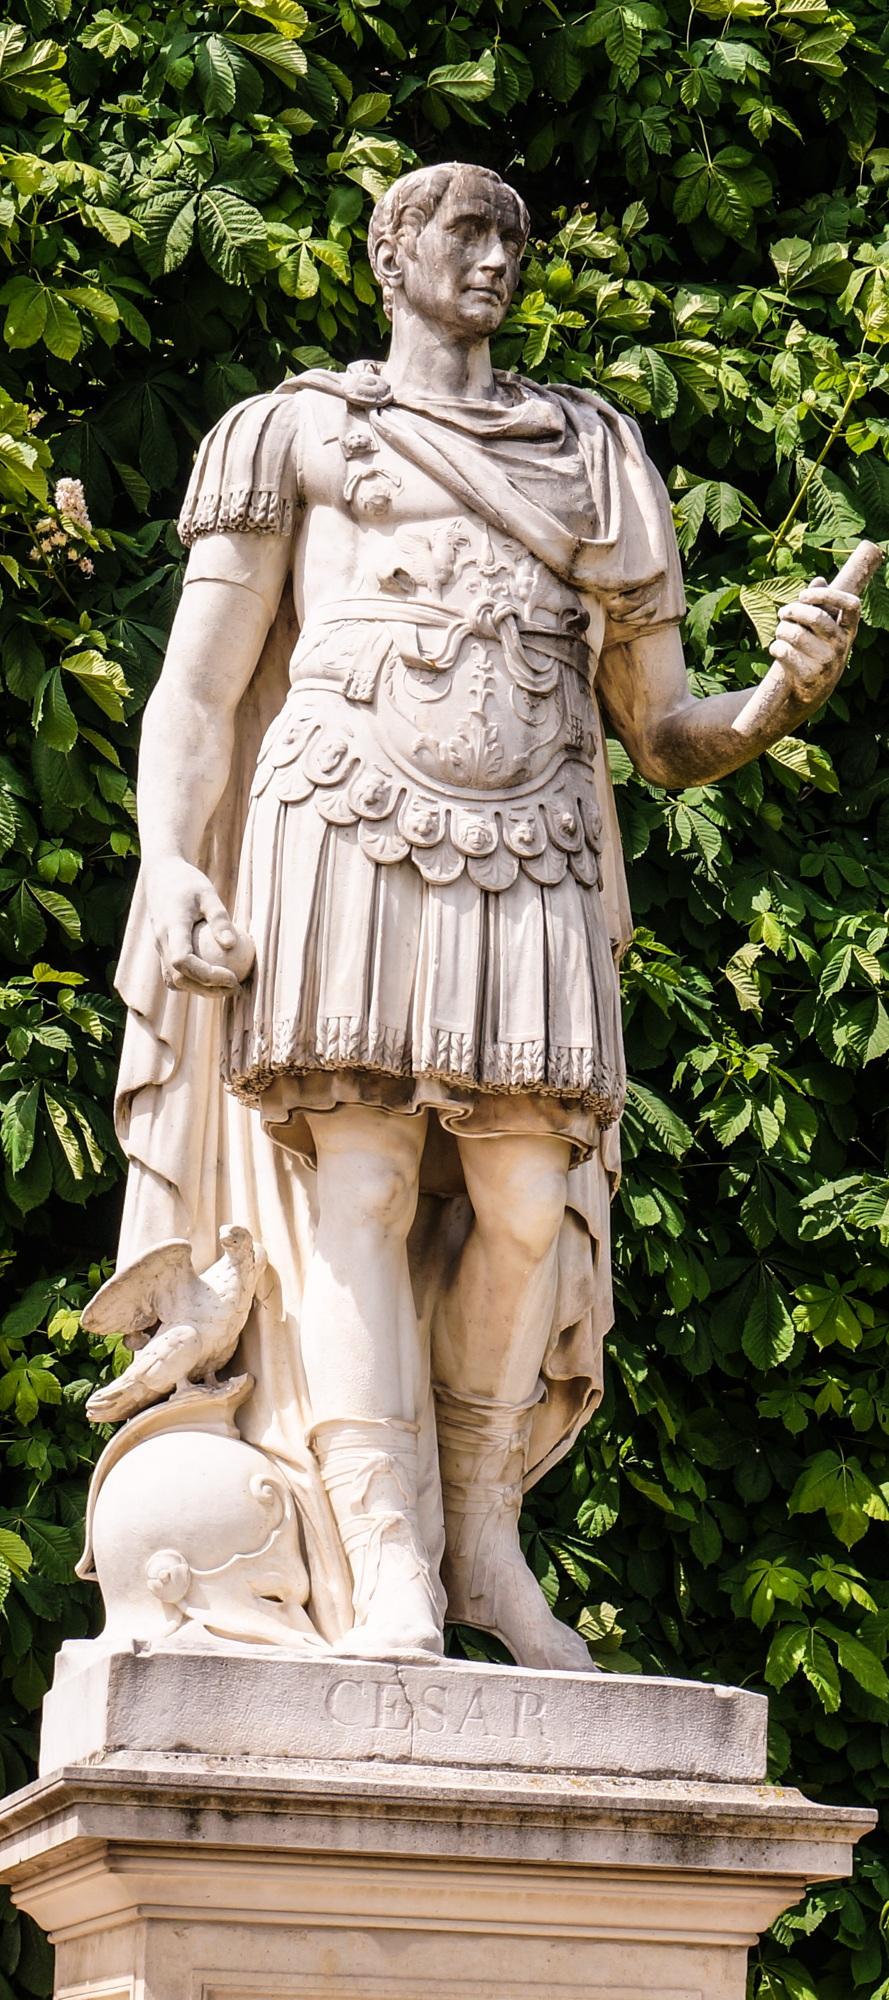 Fotos gratis arquitectura par s piedra monumento francia estatua jard n obra de arte - Estatuas de jardin ...